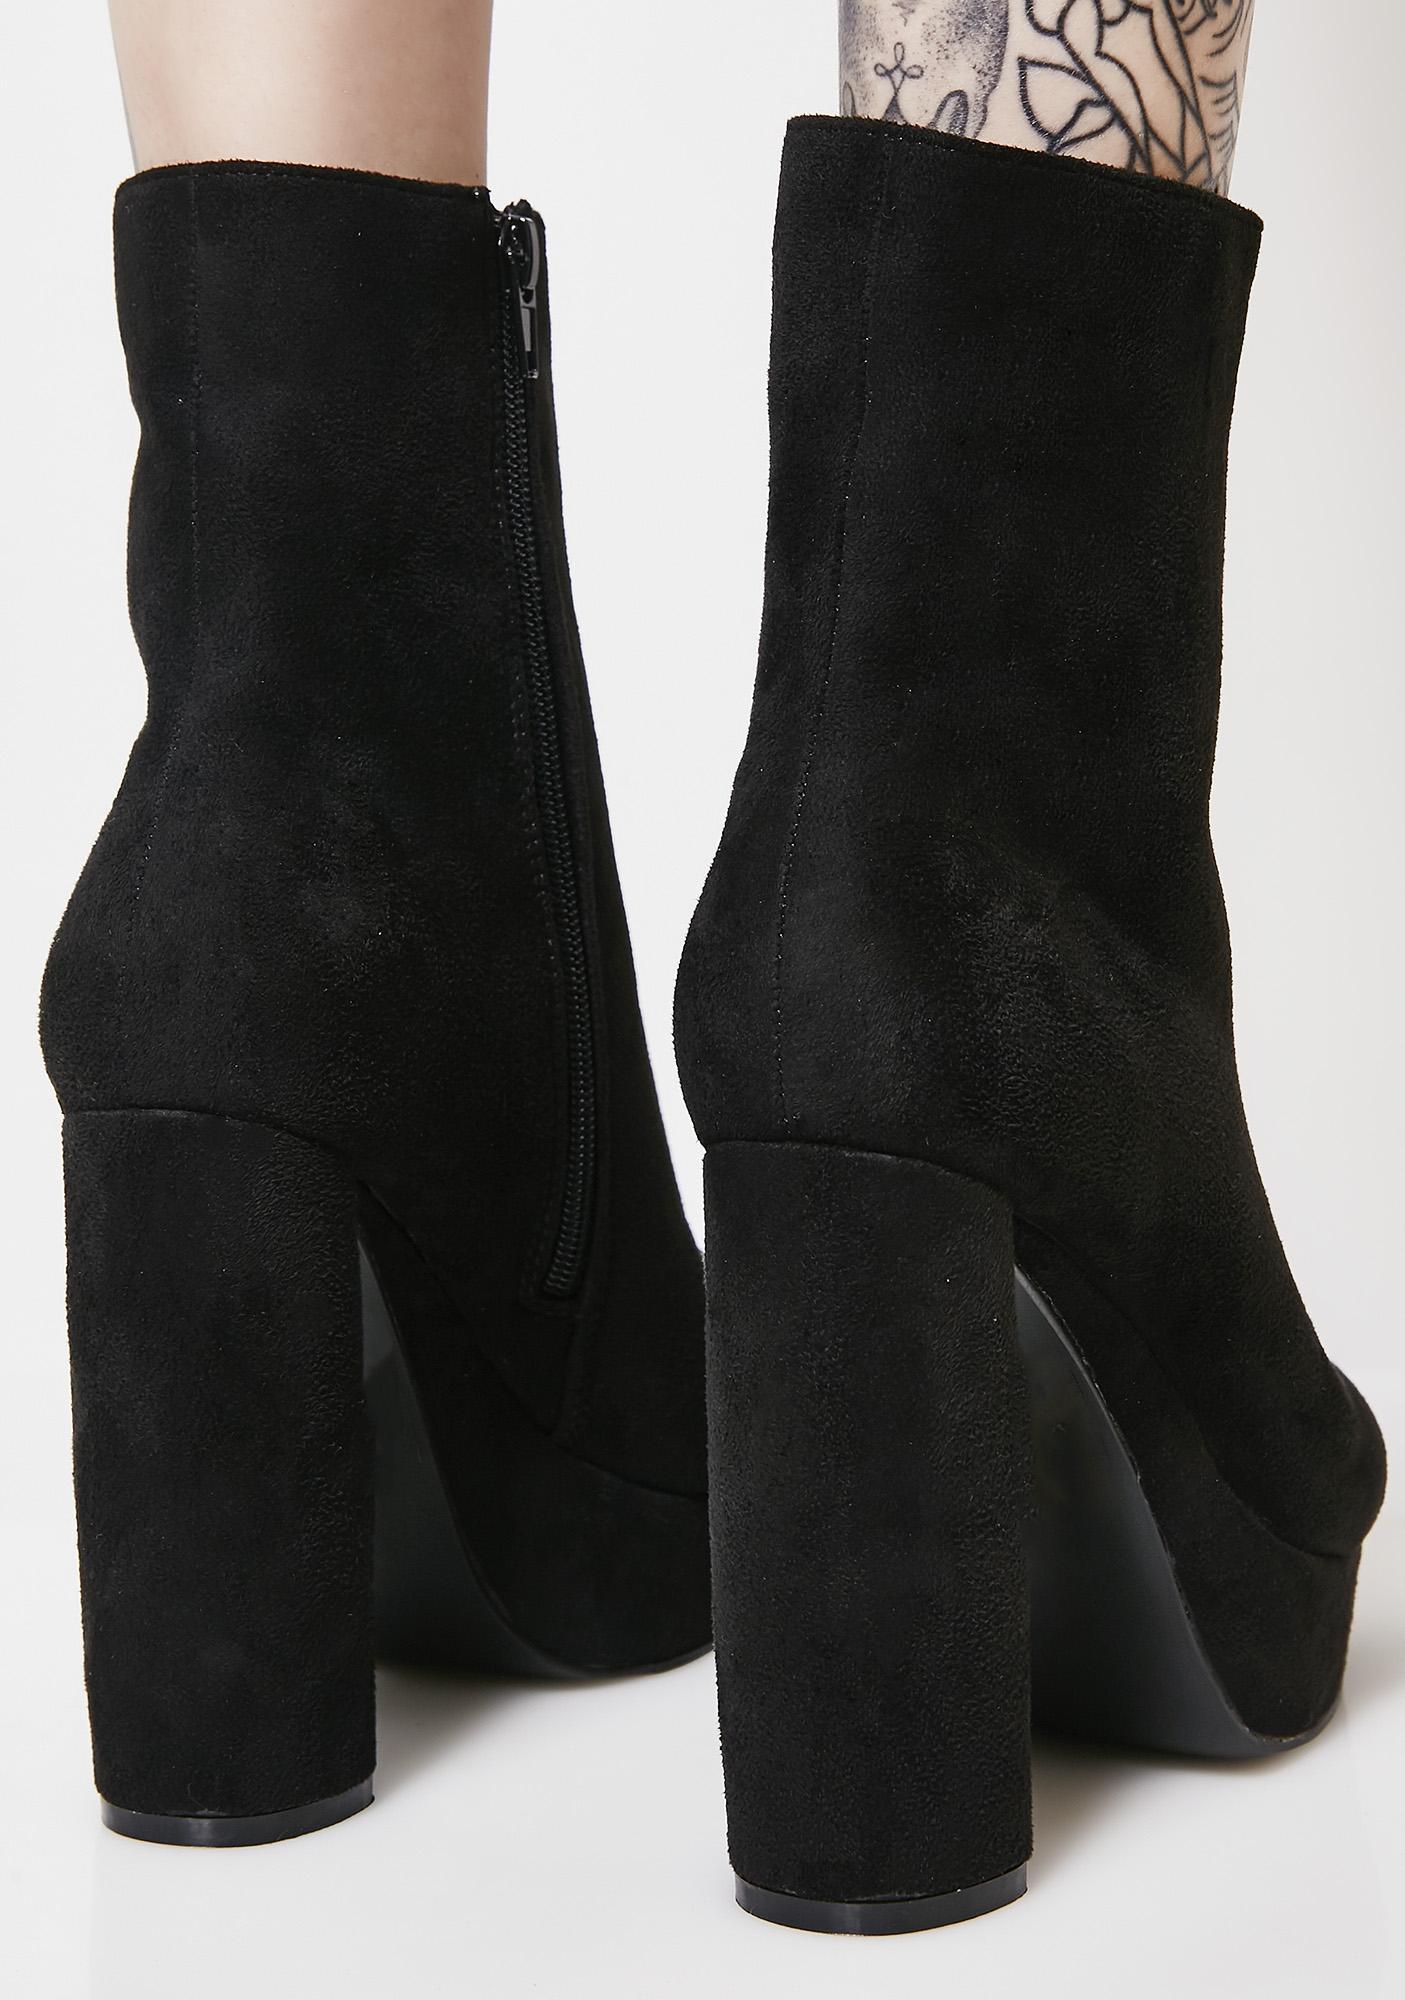 Public Desire Sceptic Zip Ankle Boots